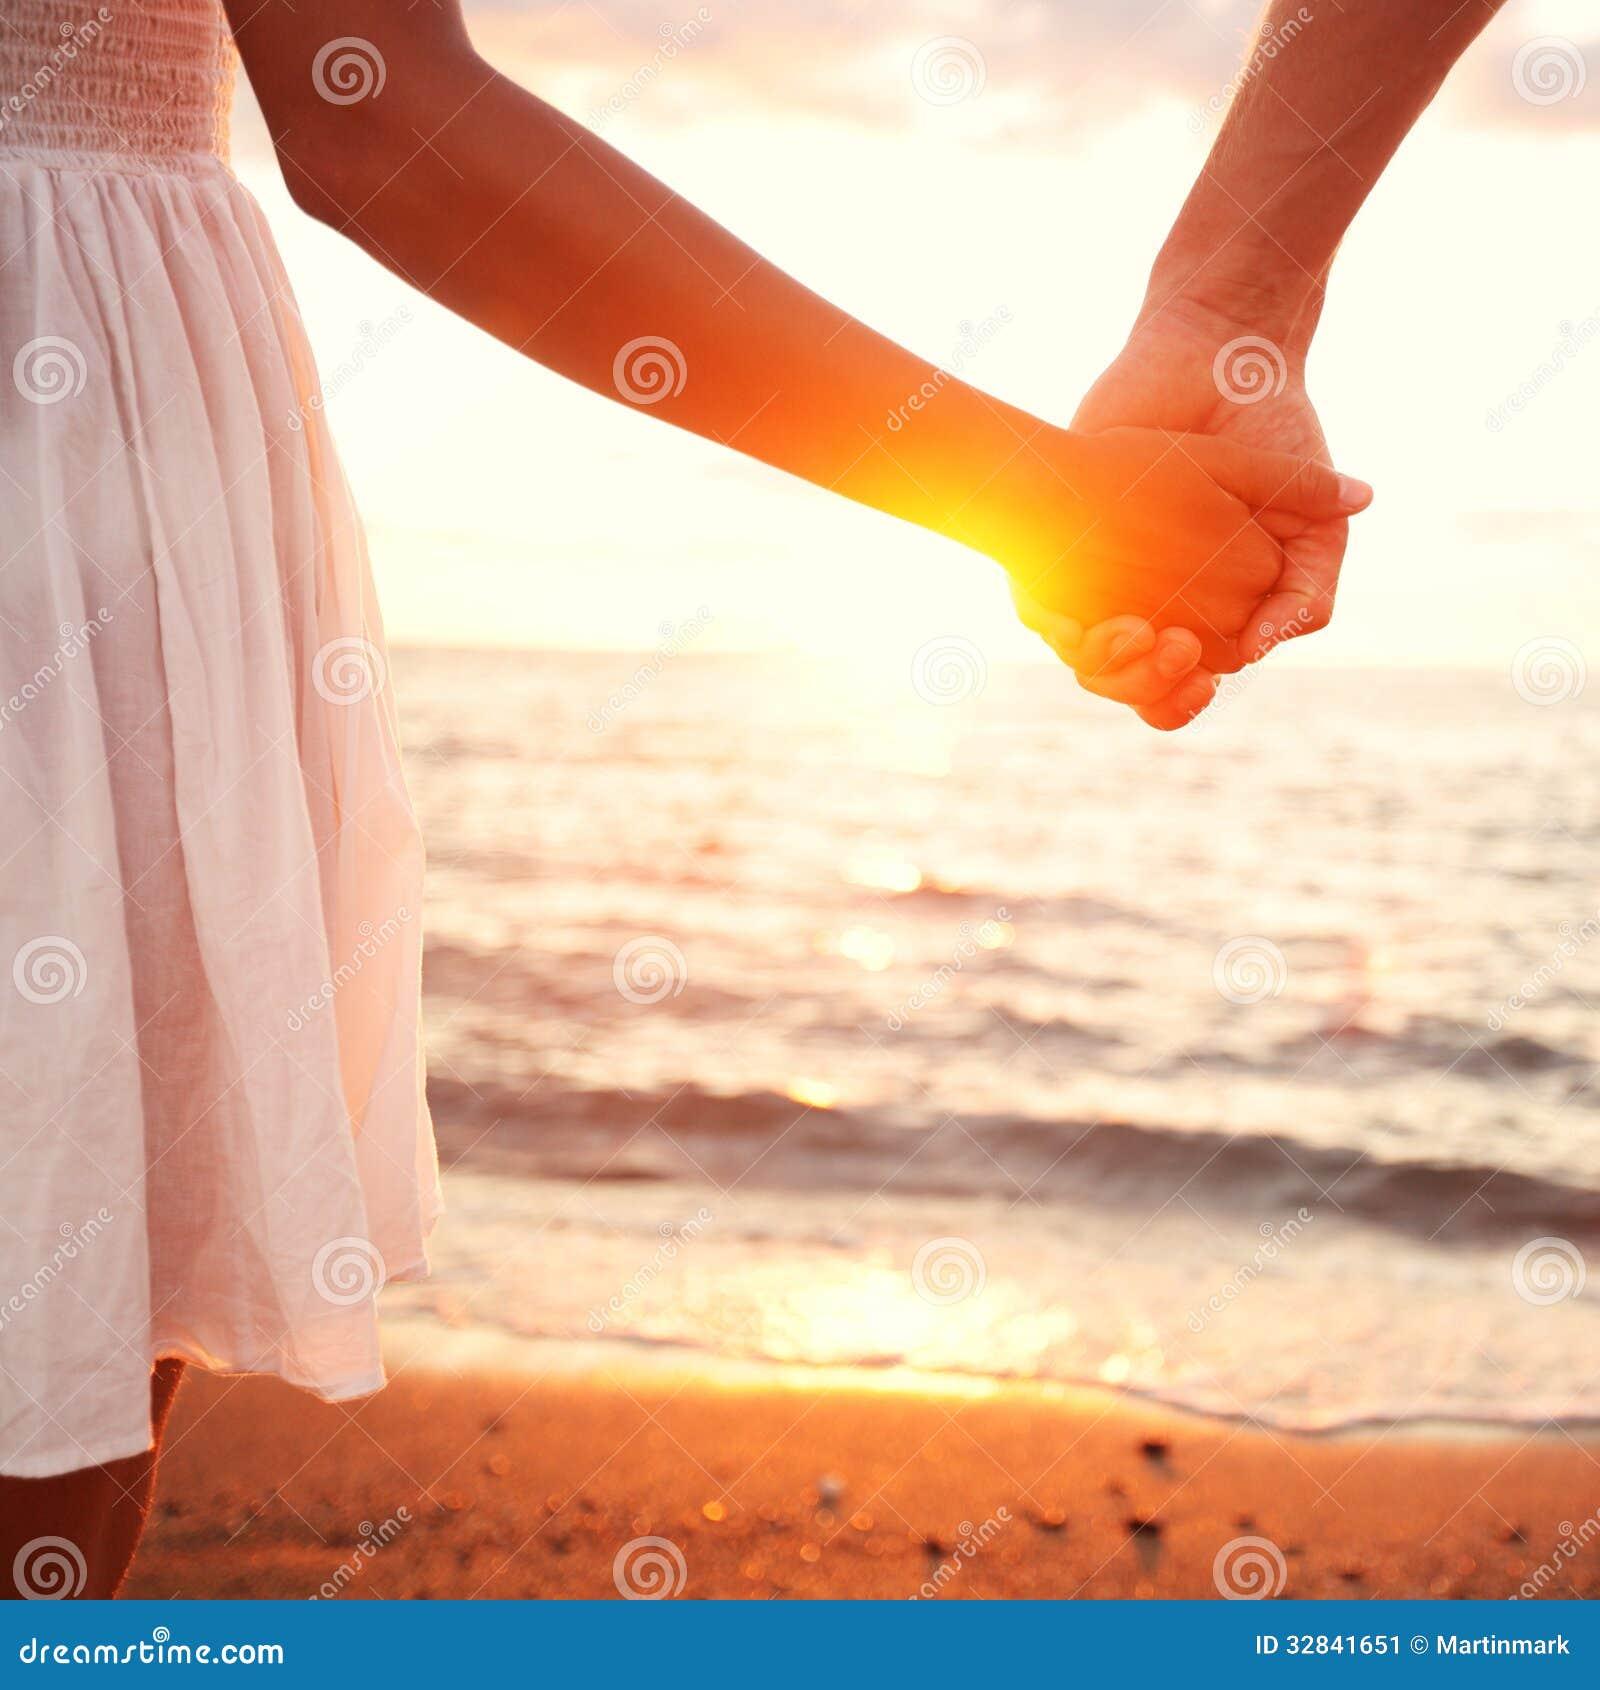 Romantic Couple Holding Hands, Beach Sunset Stock